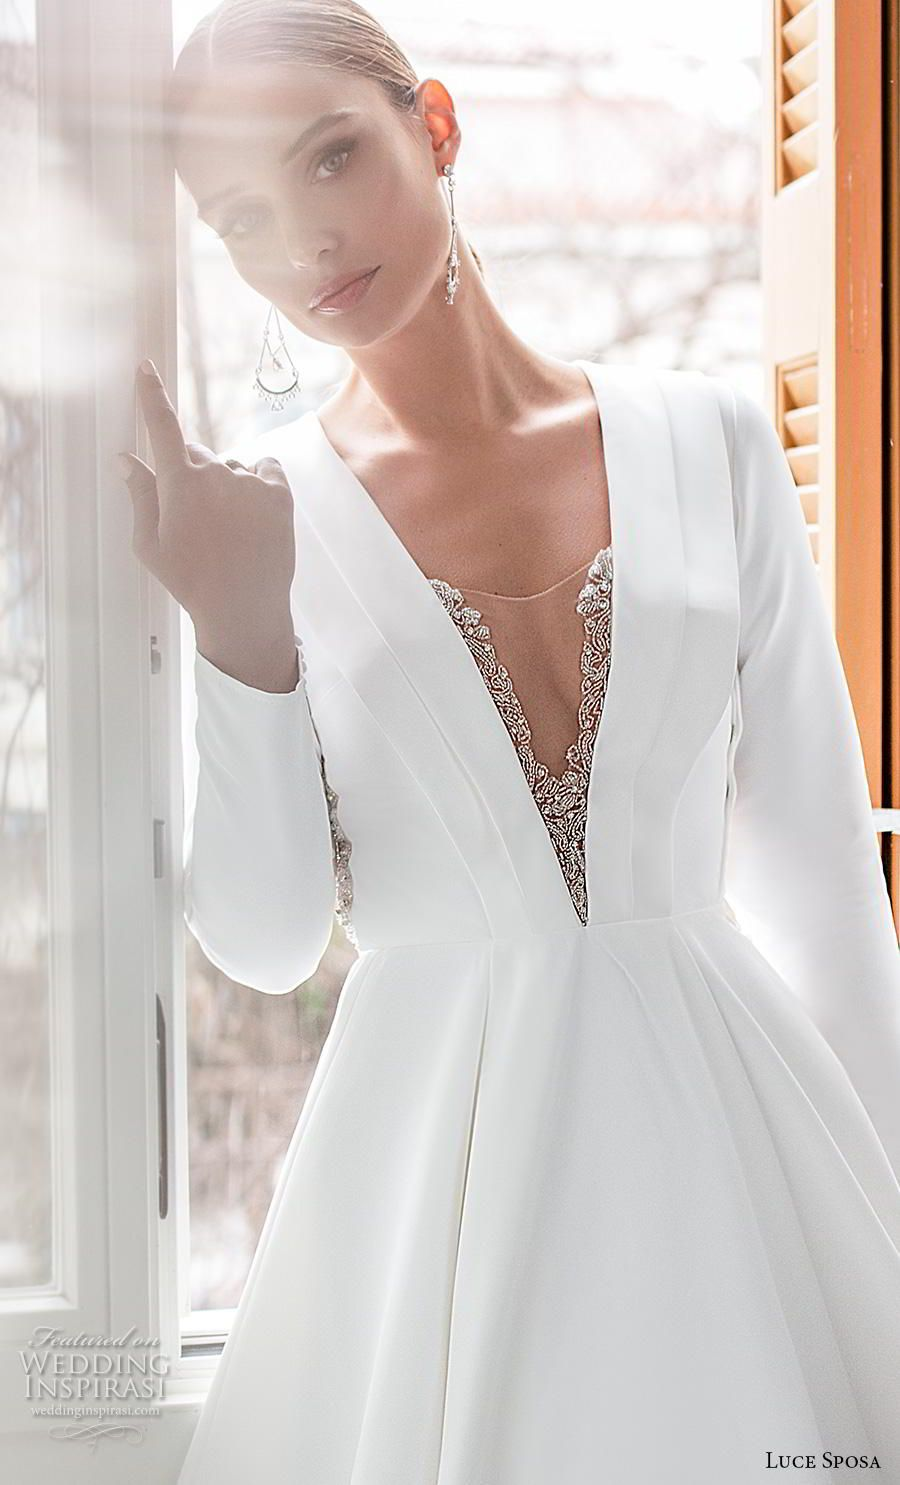 Luce Sposa 2020 Wedding Dresses Greece Campaign Bridal Collection Wedding Inspirasi Wedding Dress Guide Bridal Dress Stores A Line Wedding Dress [ 1485 x 900 Pixel ]